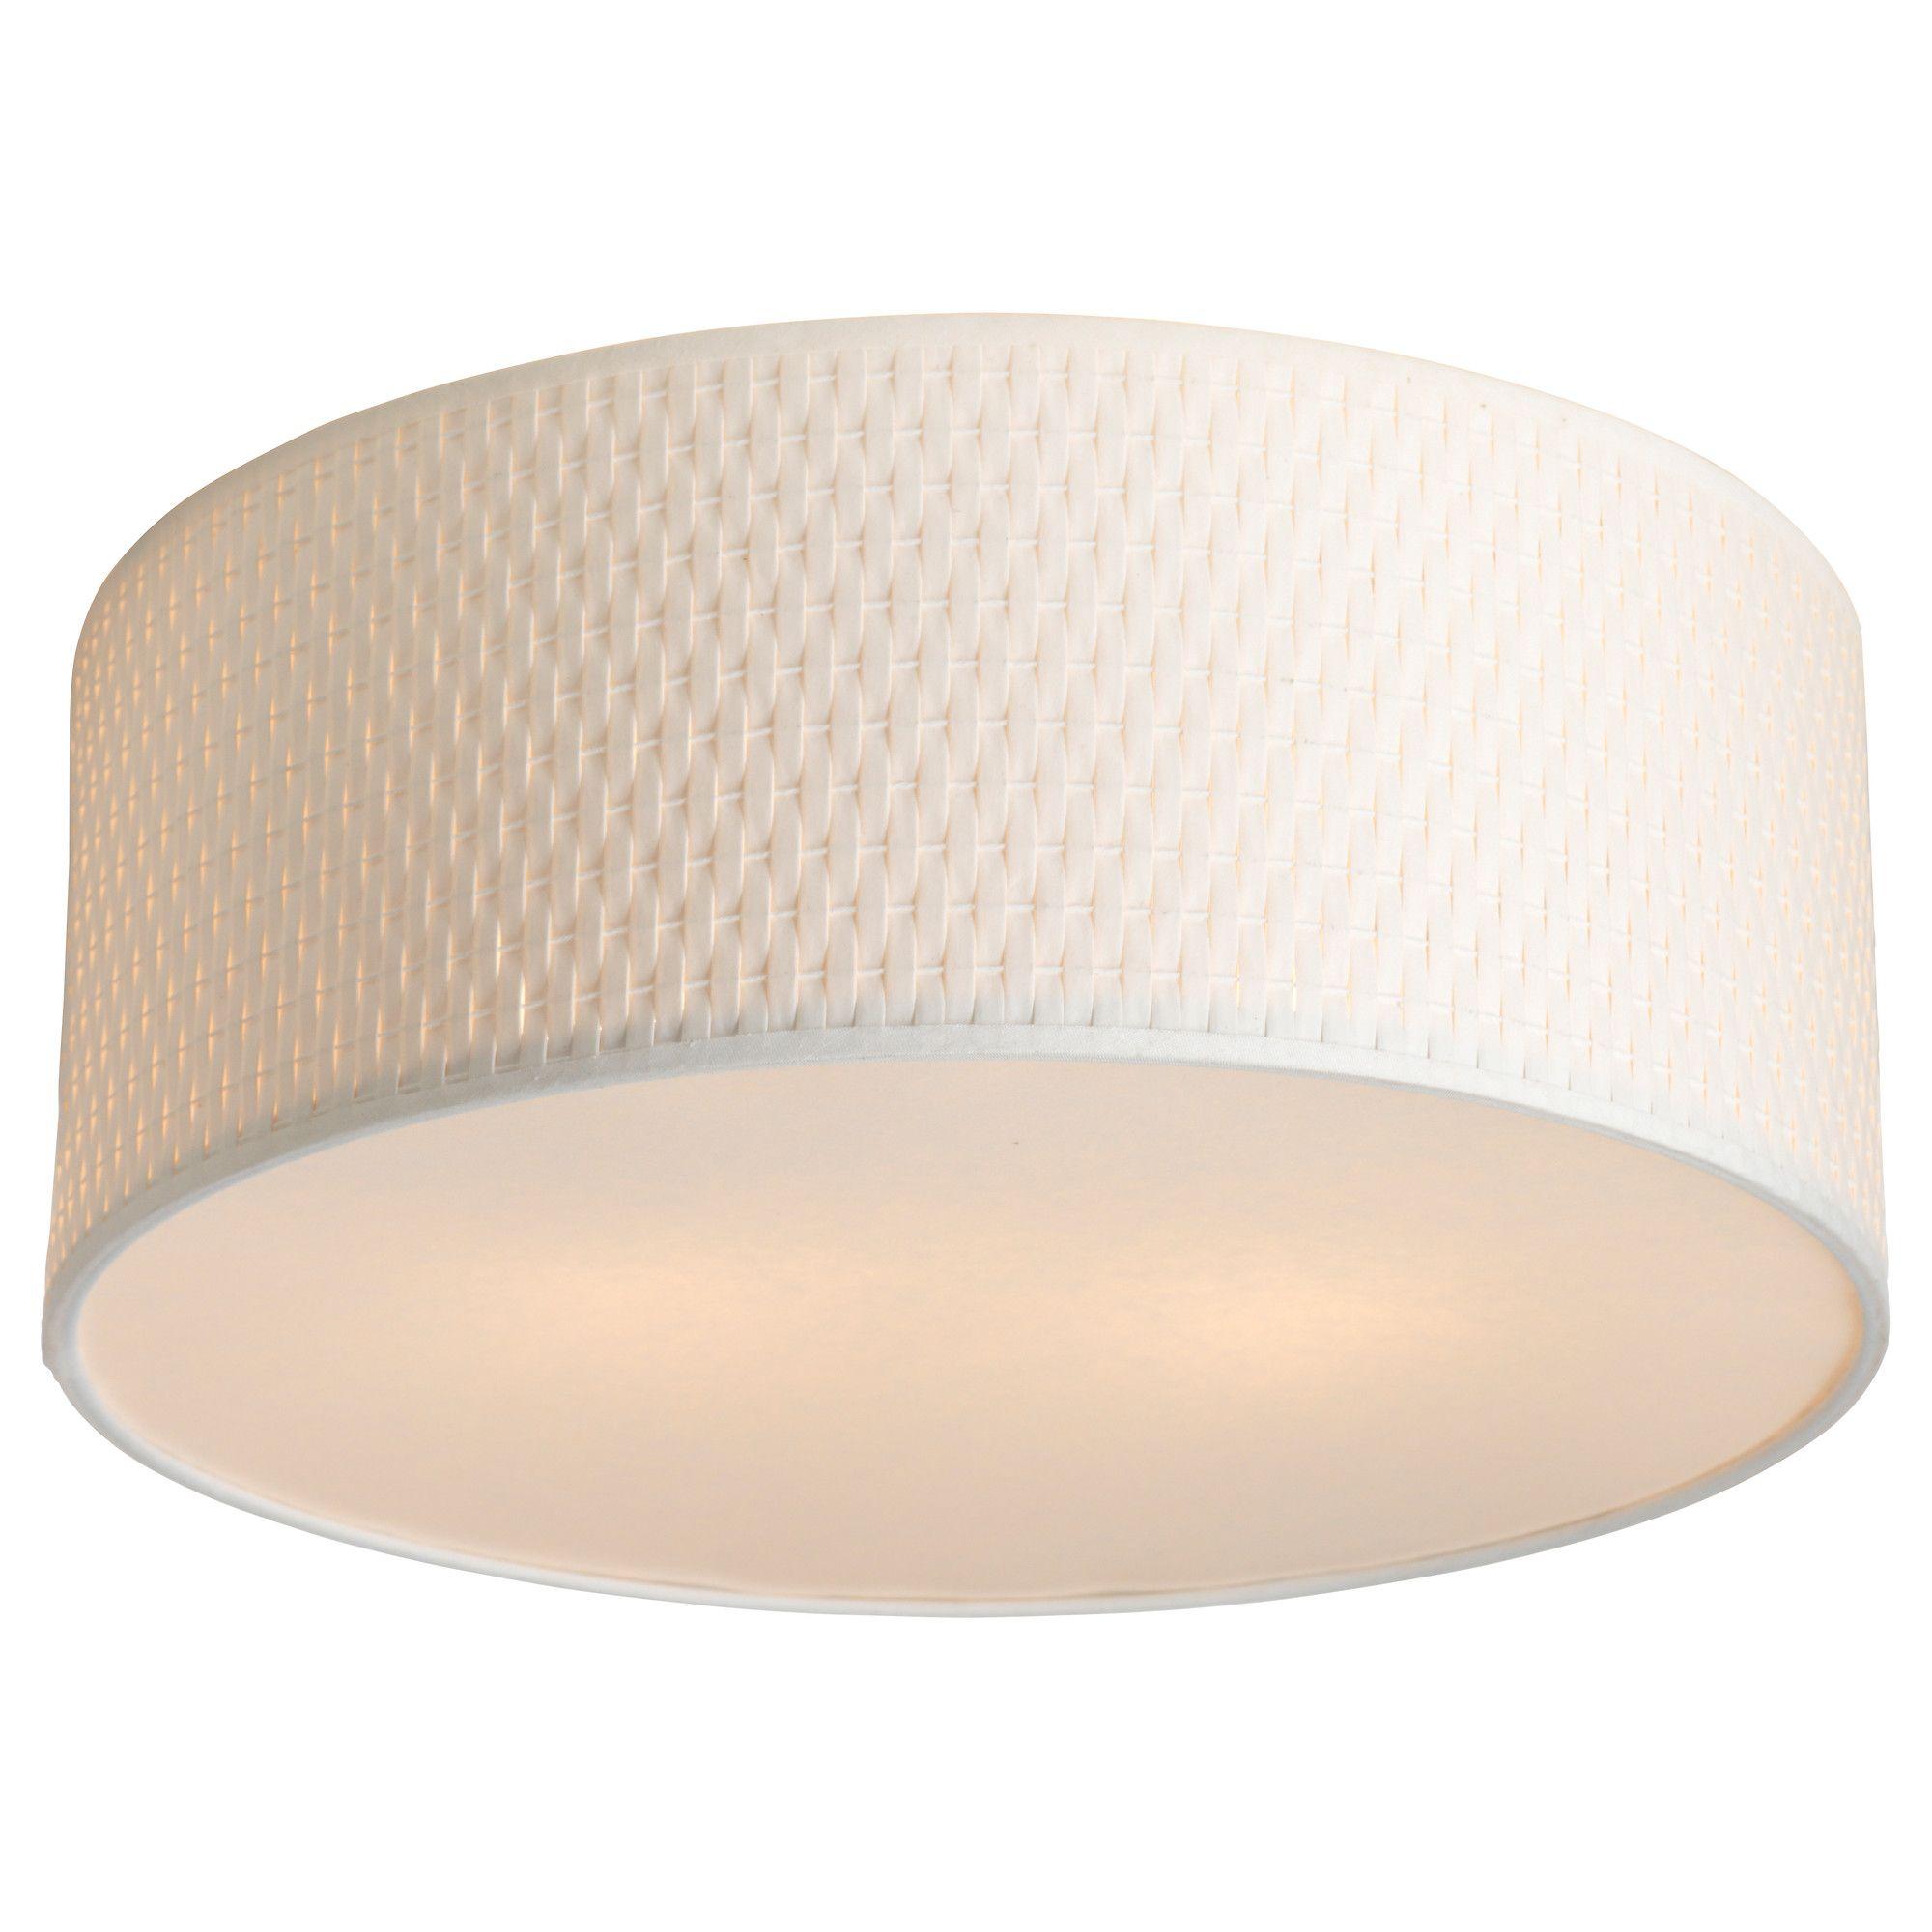 Alang Deckenleuchte Weiss Ikea Deutschland Ikea Deckenleuchte Ikea Deckenlampe Und Beleuchtung Decke